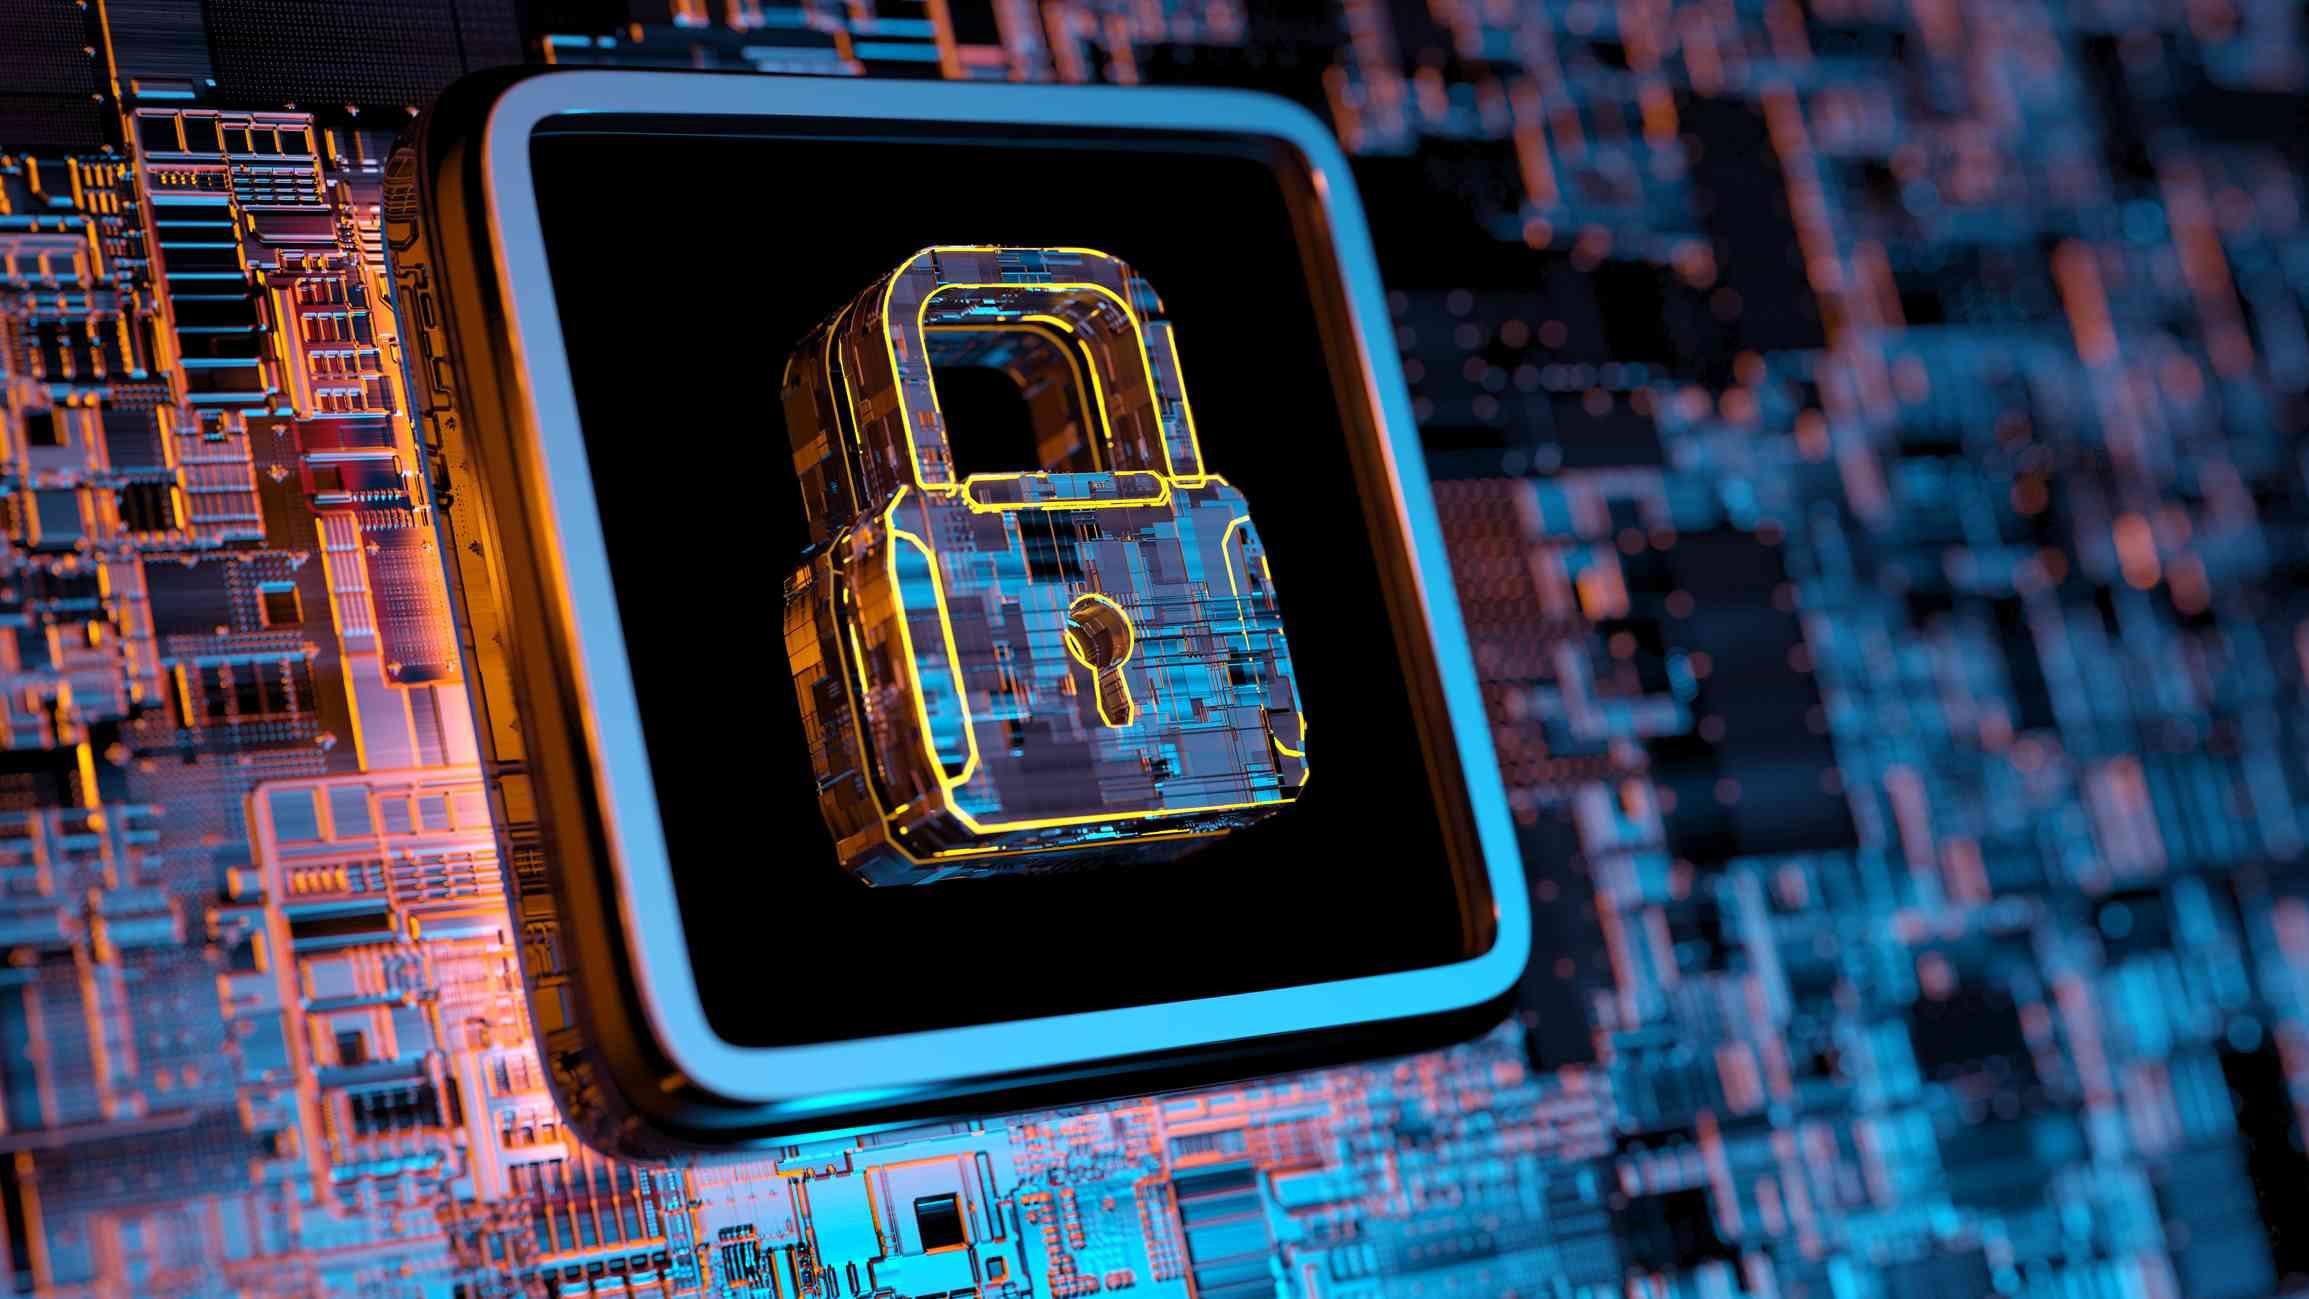 Digital Security concept image.